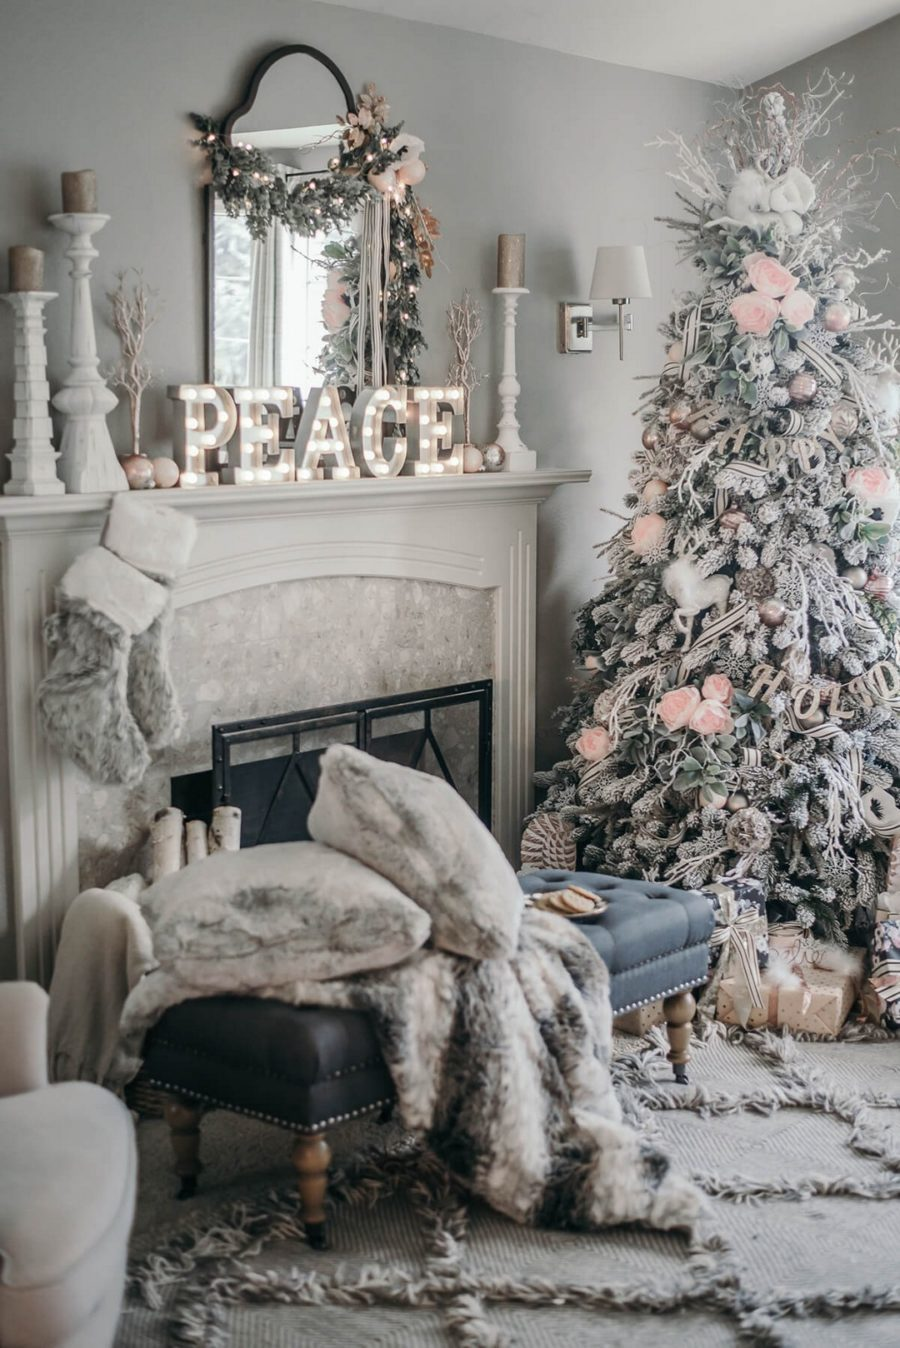 Winter wonderland Christmas decorating theme